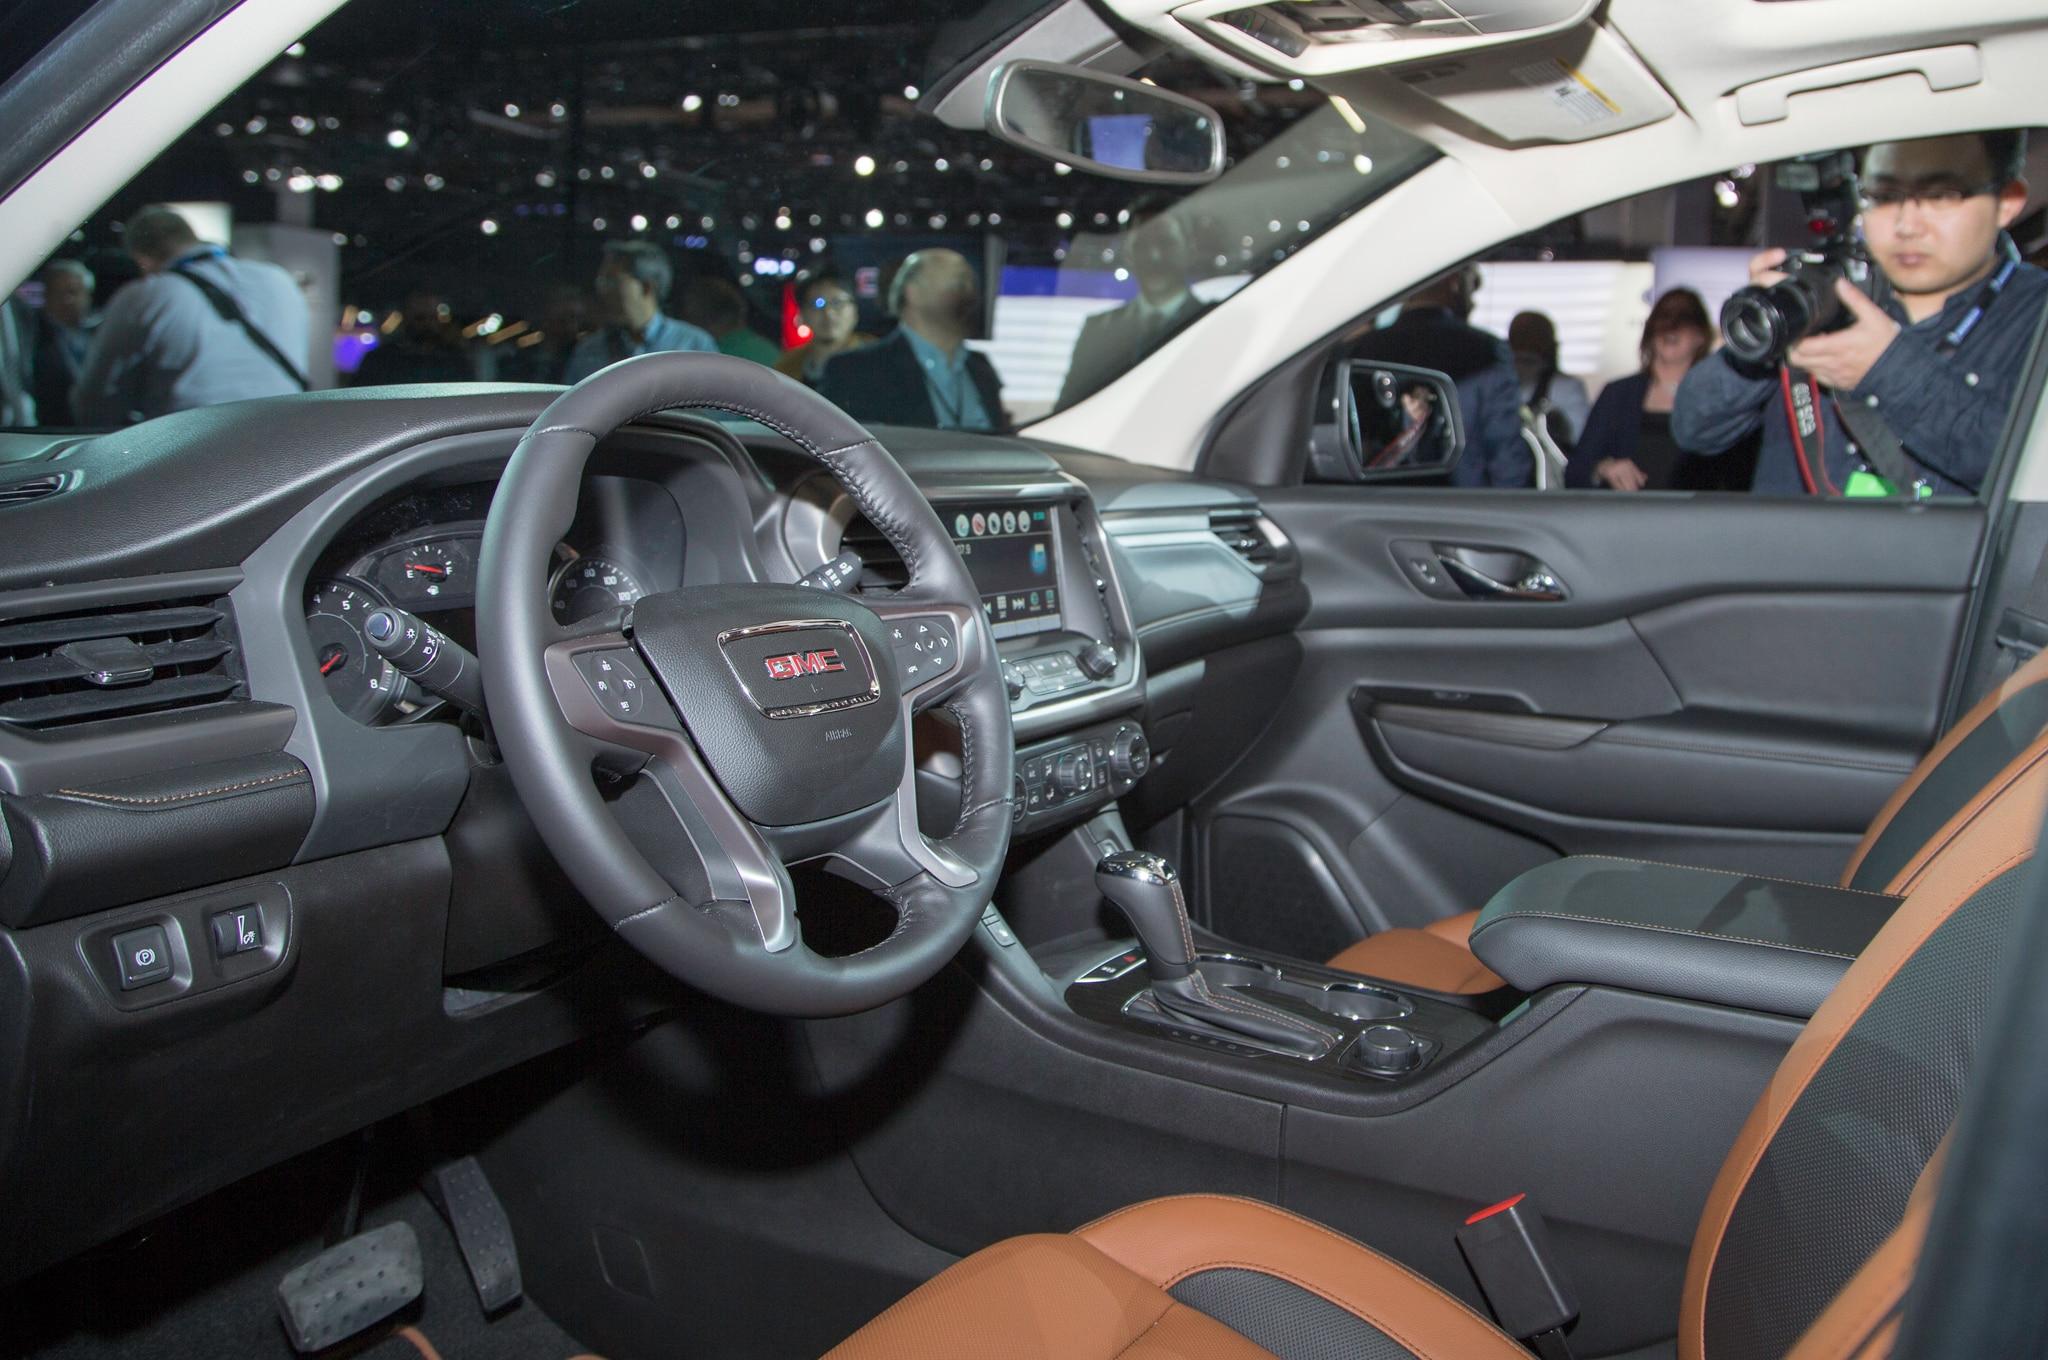 2015 gmc acadia interior. show more 2015 gmc acadia interior